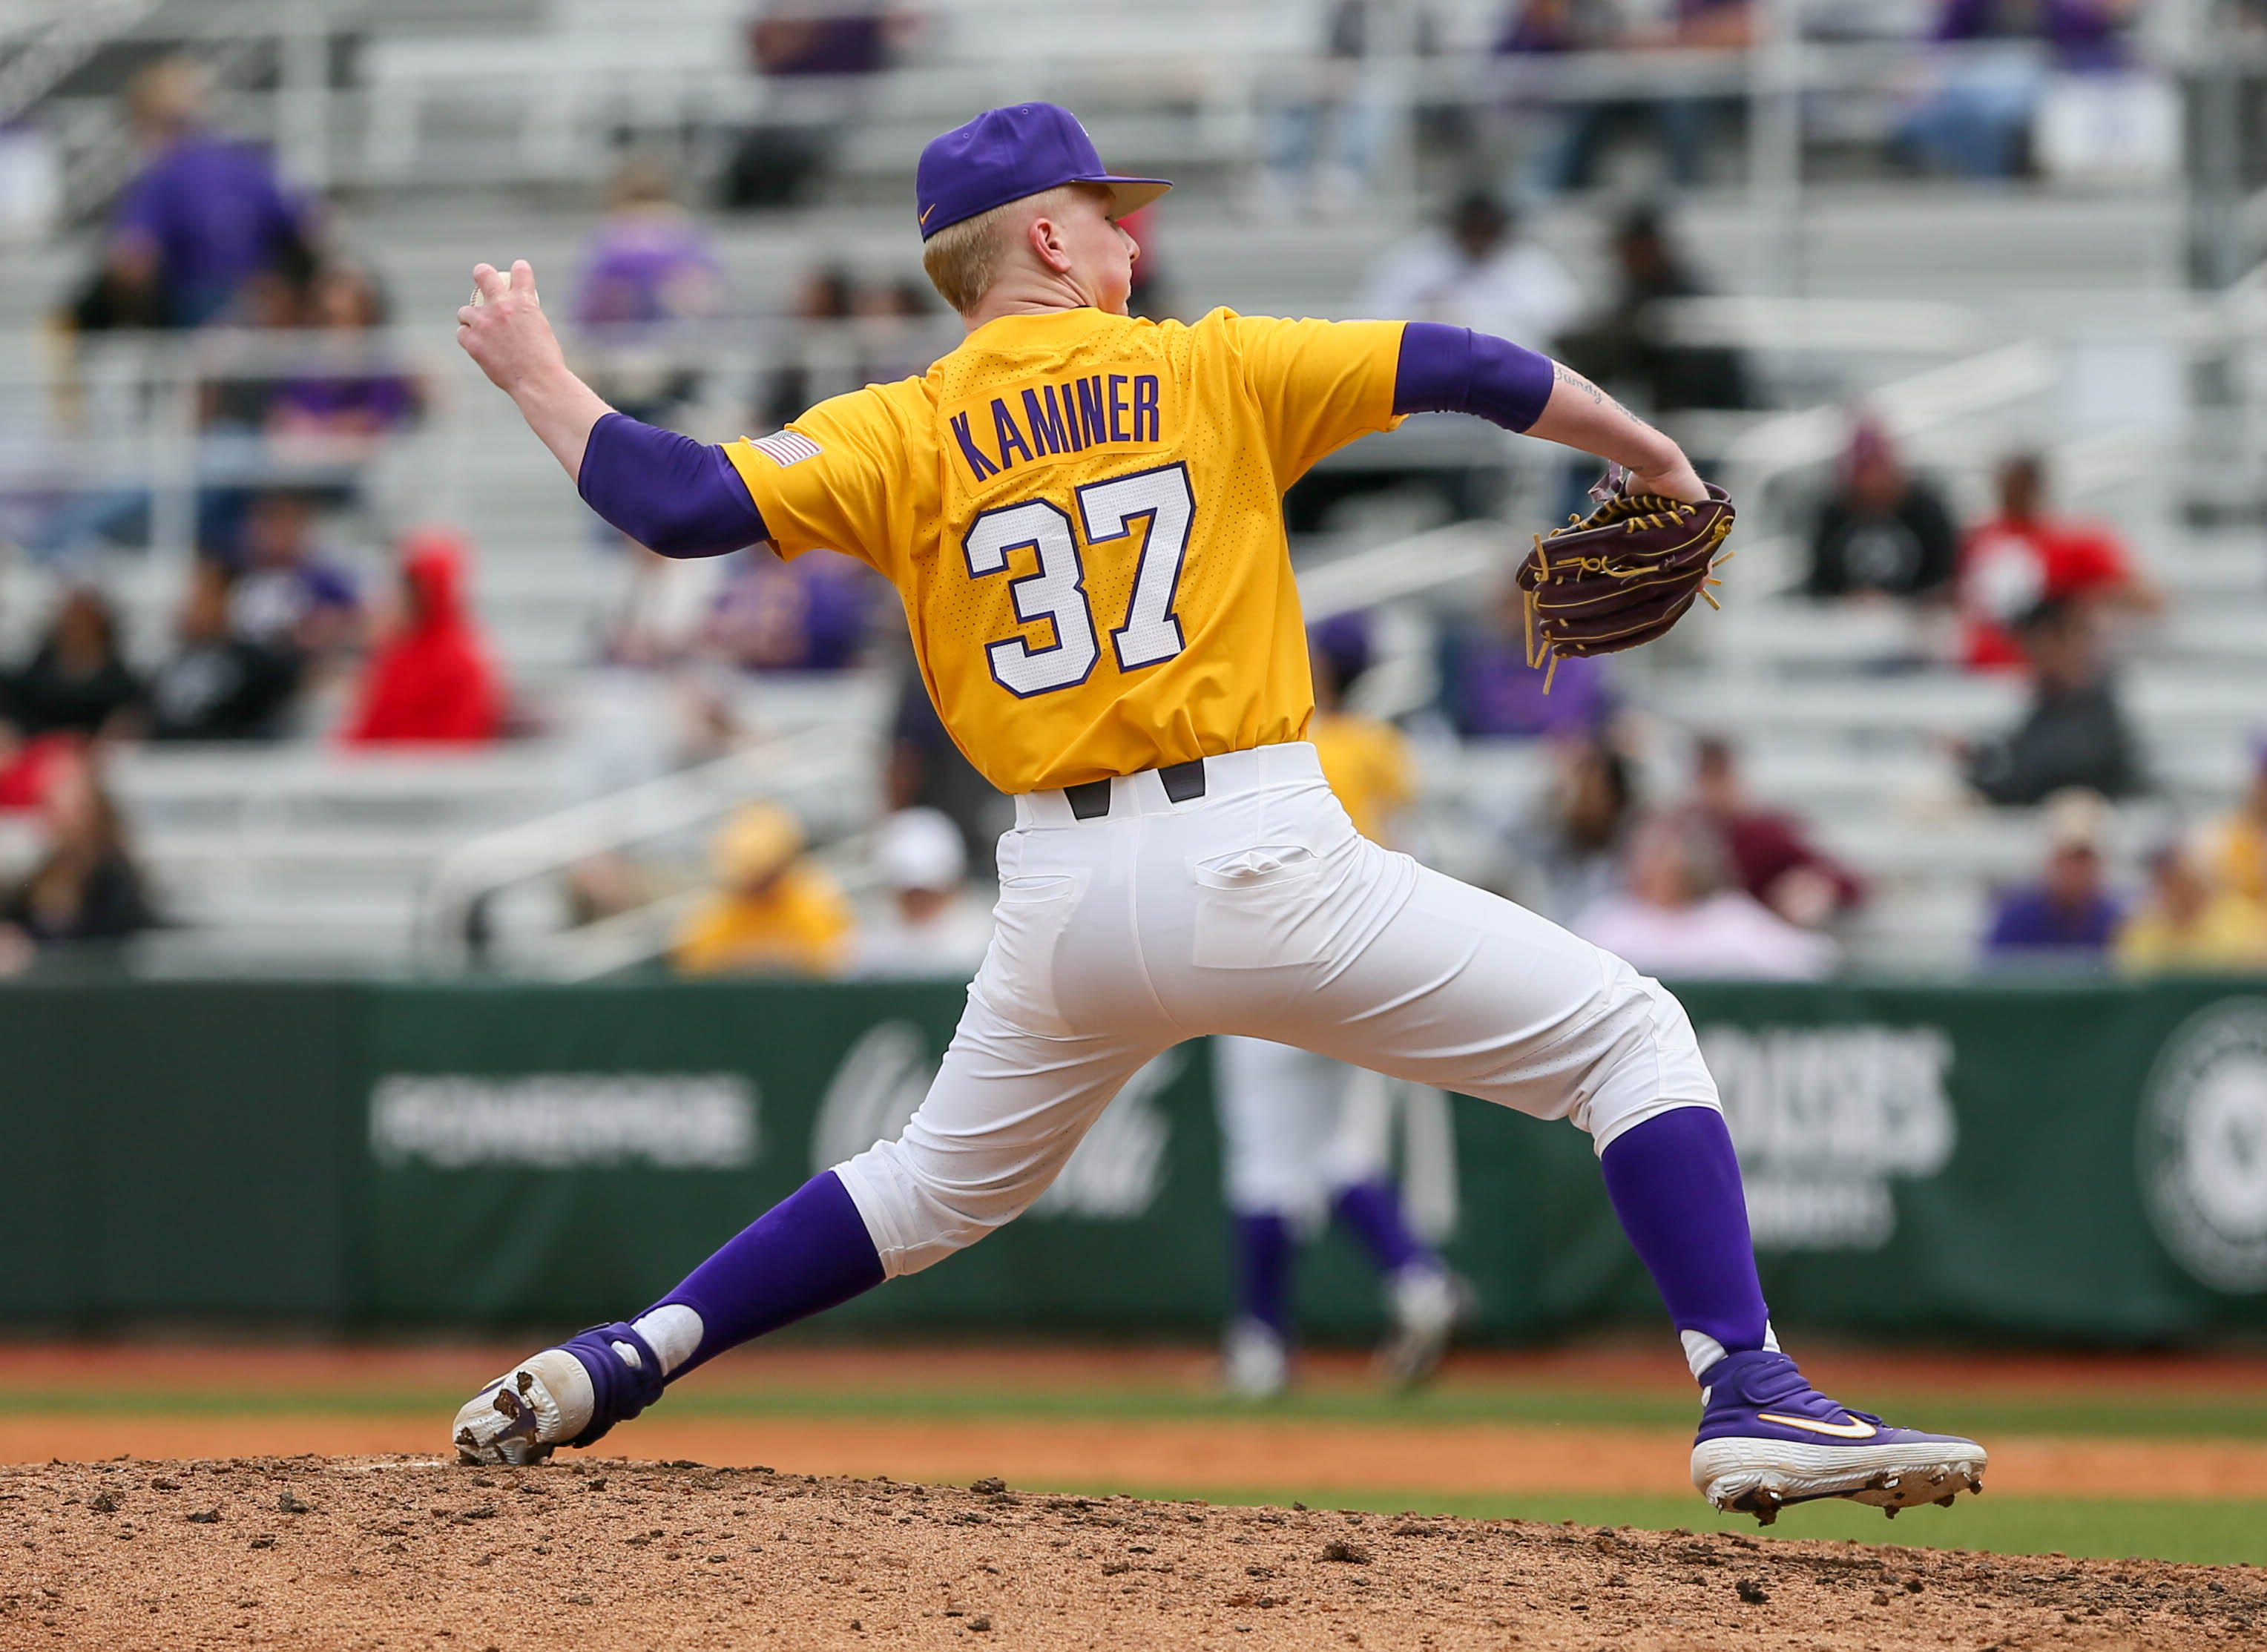 Brandon Kaminer S Tough Road To Lsu Starter Role